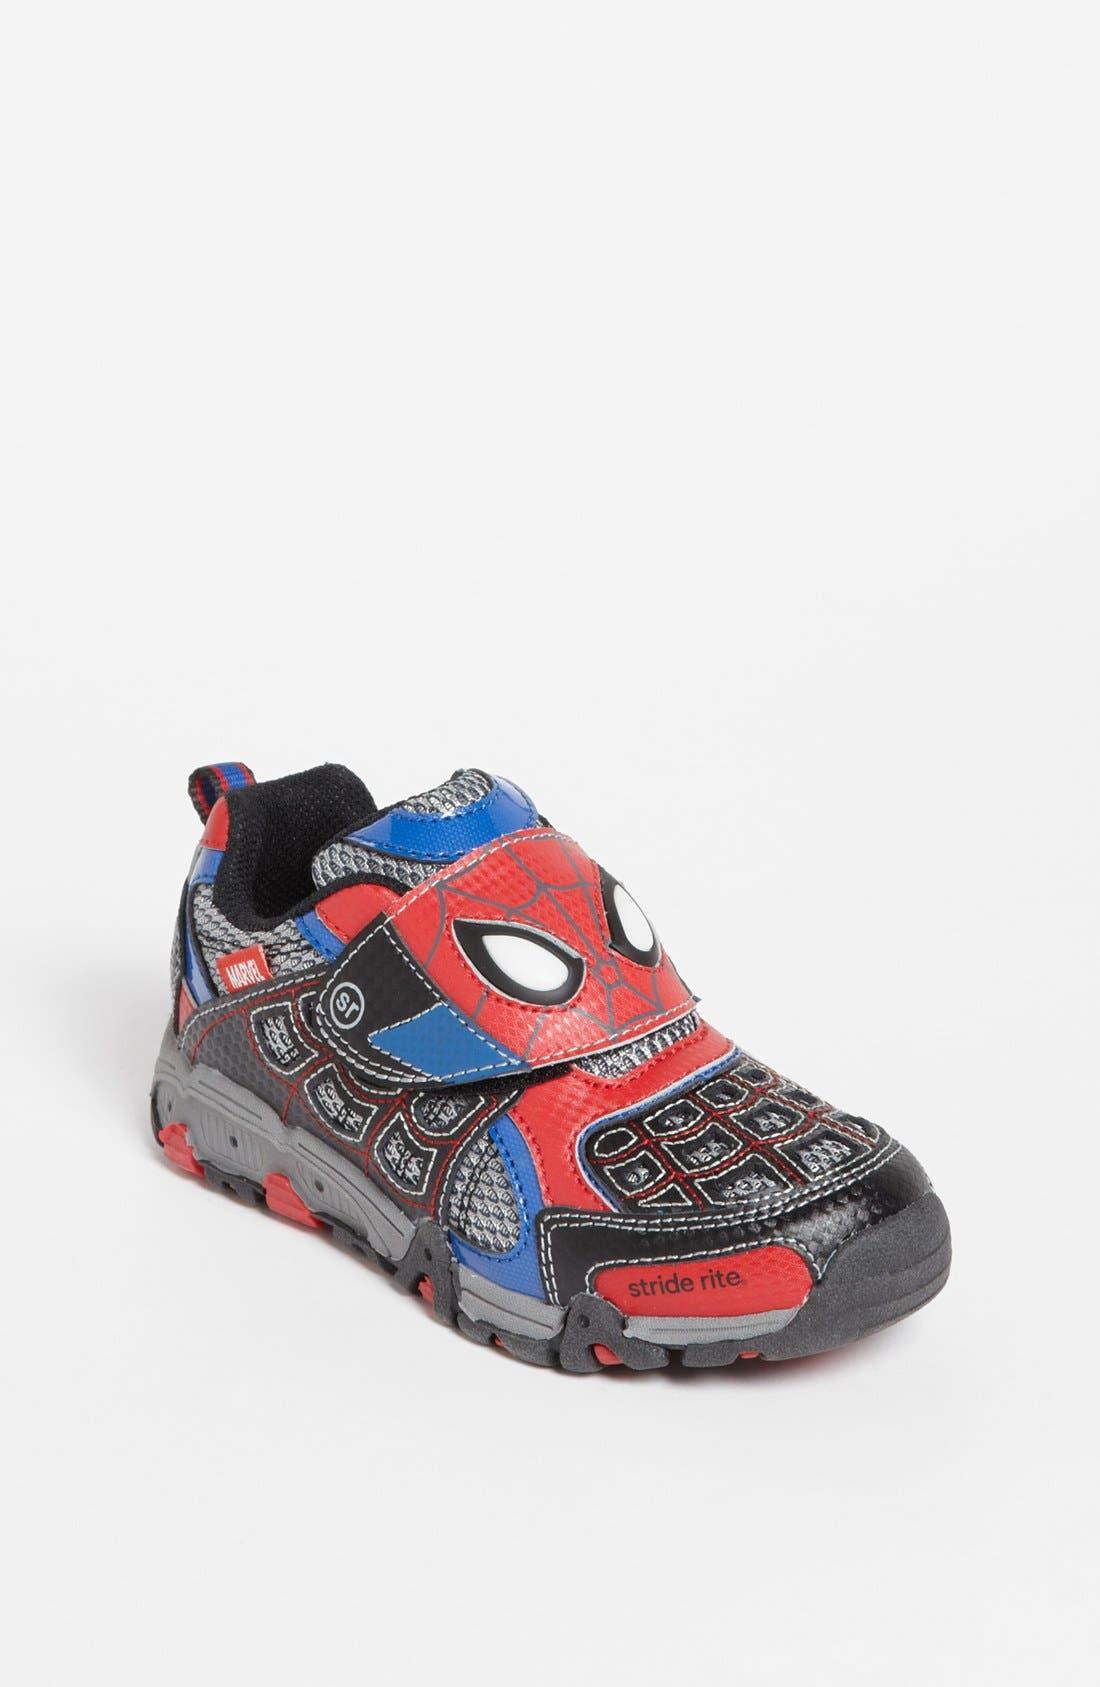 Main Image - Stride Rite 'Spidey Lights' Sneaker (Walker, Toddler & Little Kid)